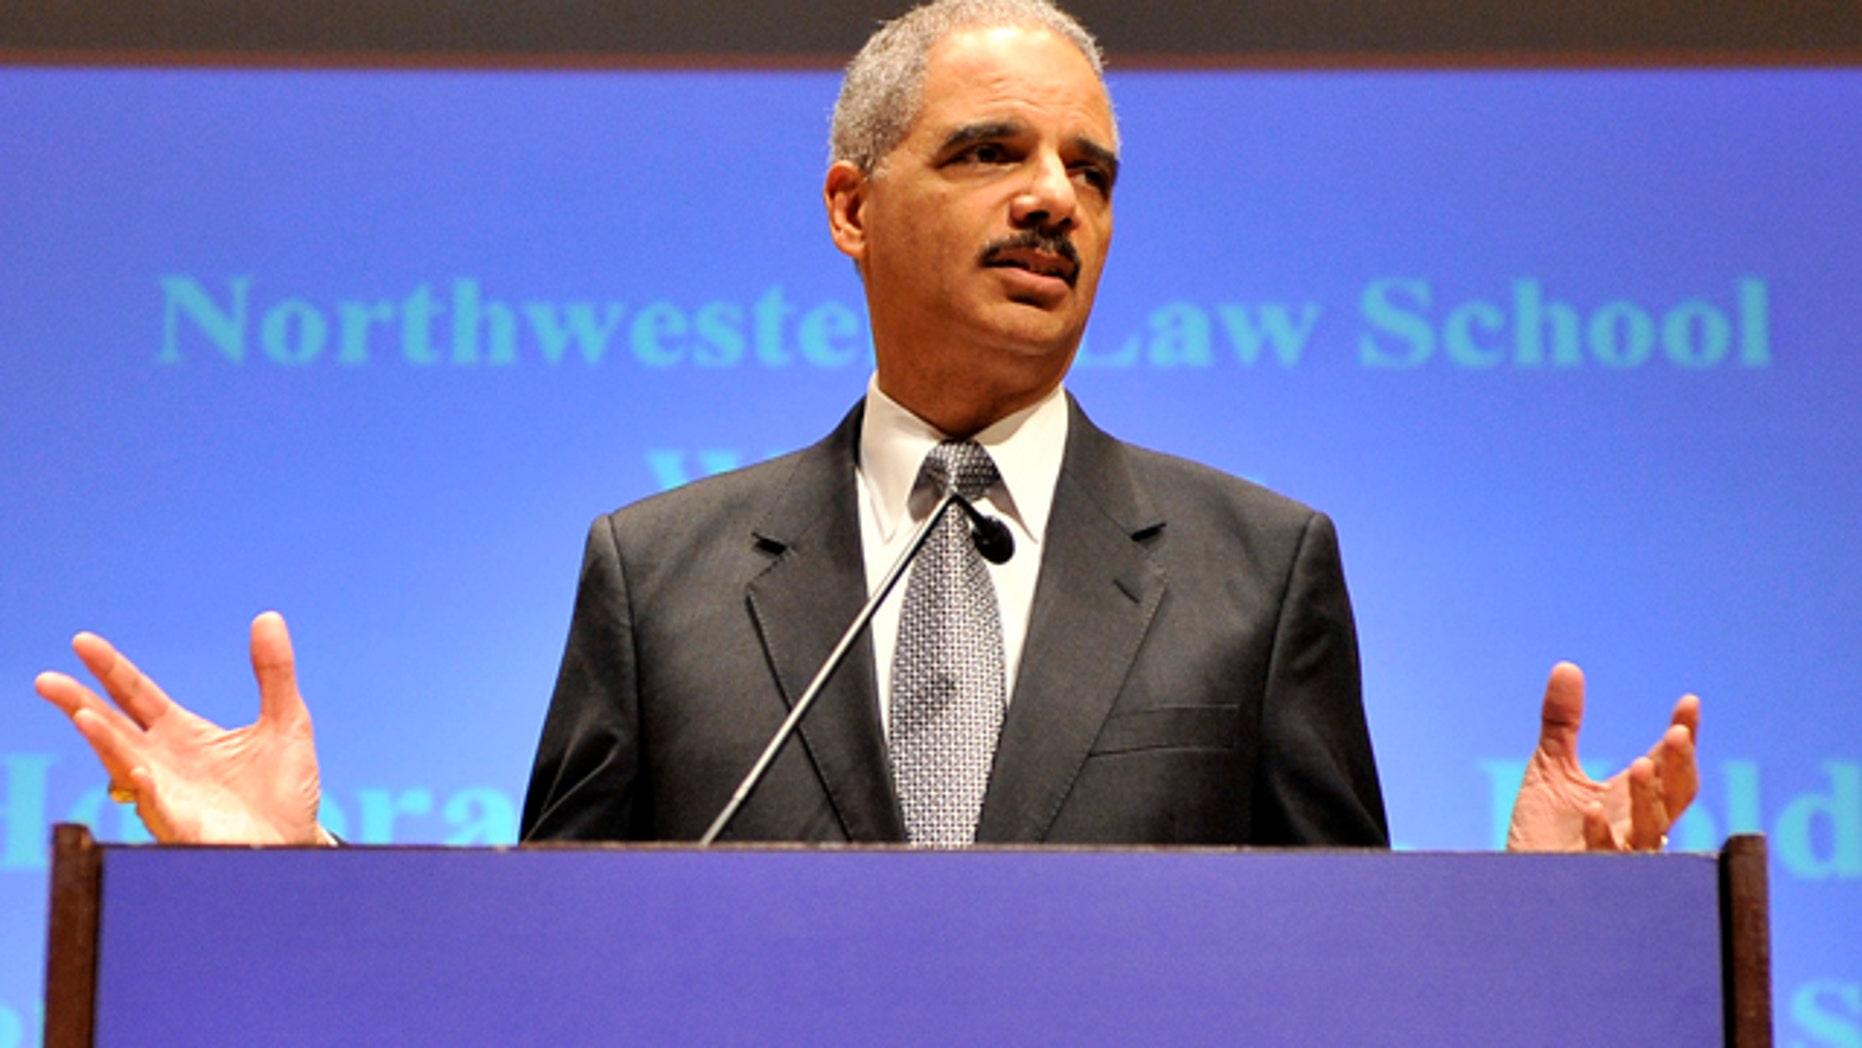 March 5, 2012: Attorney General Eric Holder speaks at the Northwestern University law school.